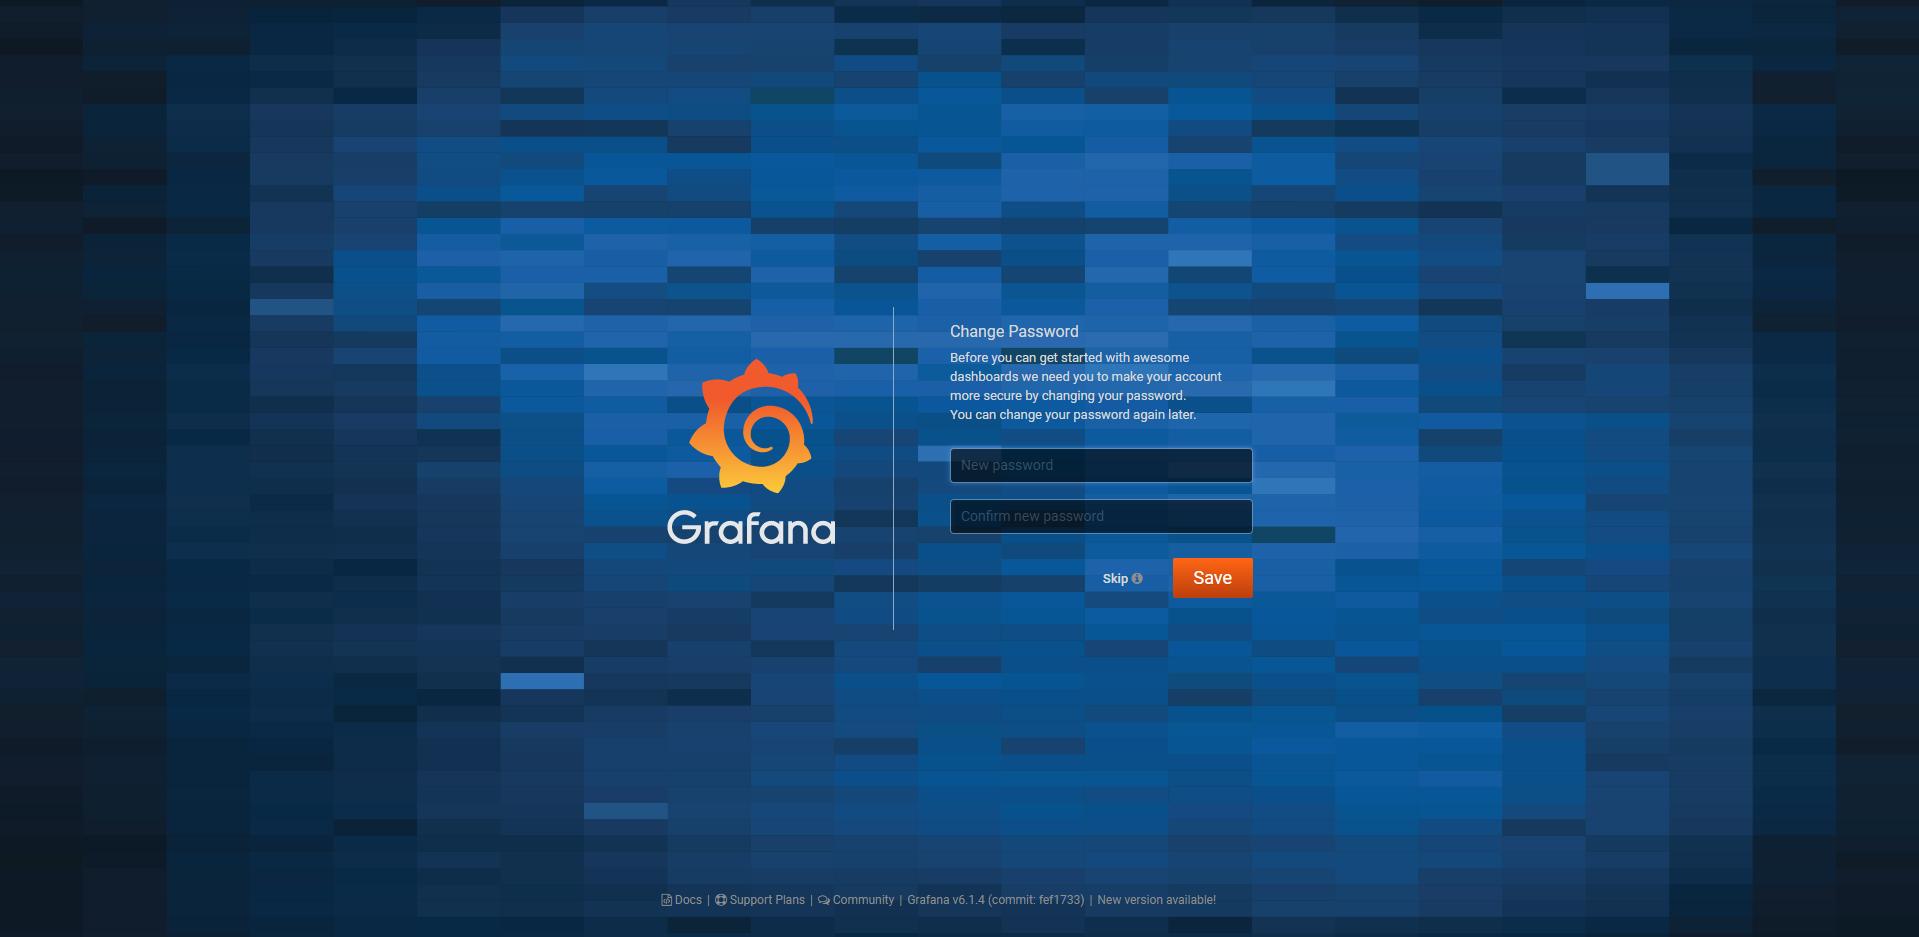 Grafana change password page